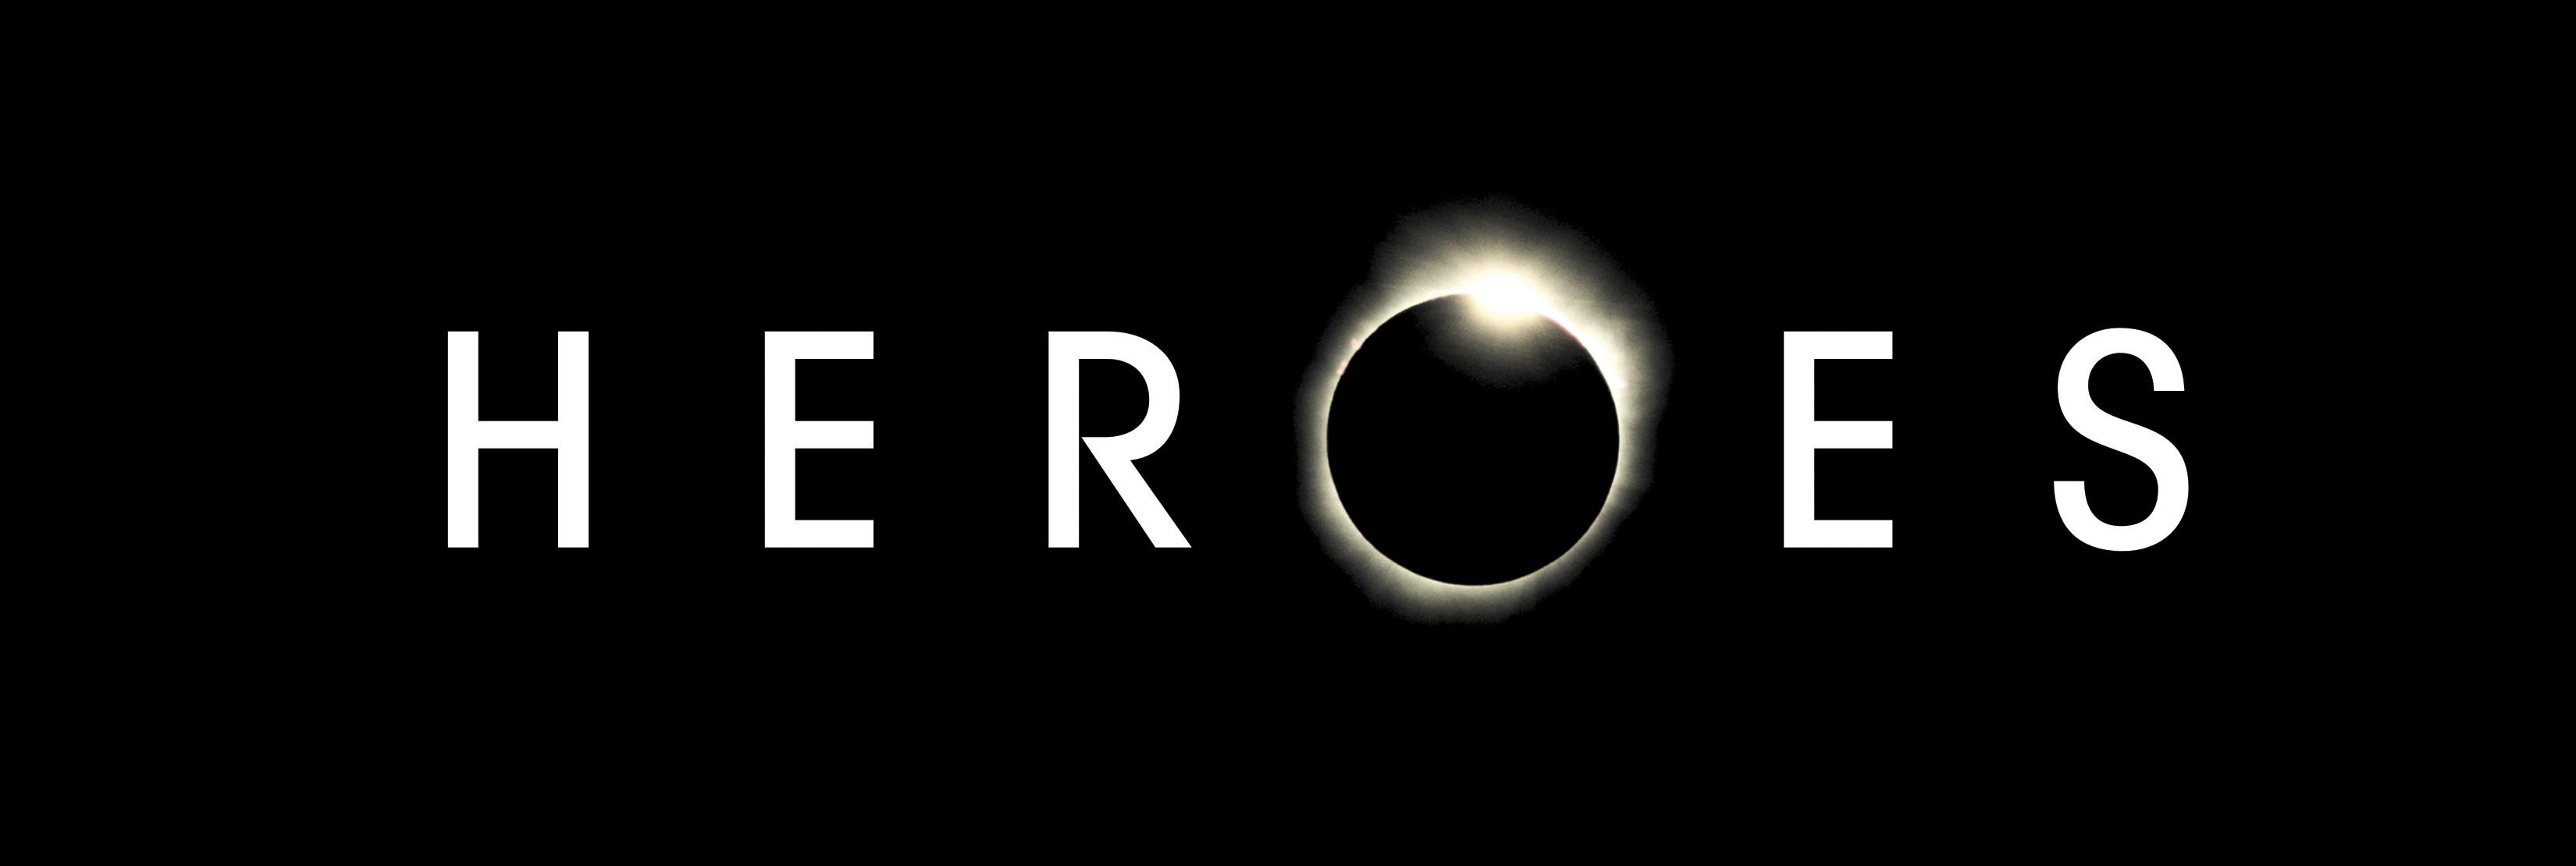 http://upload.wikimedia.org/wikipedia/fr/0/09/Heroes_logo.jpg